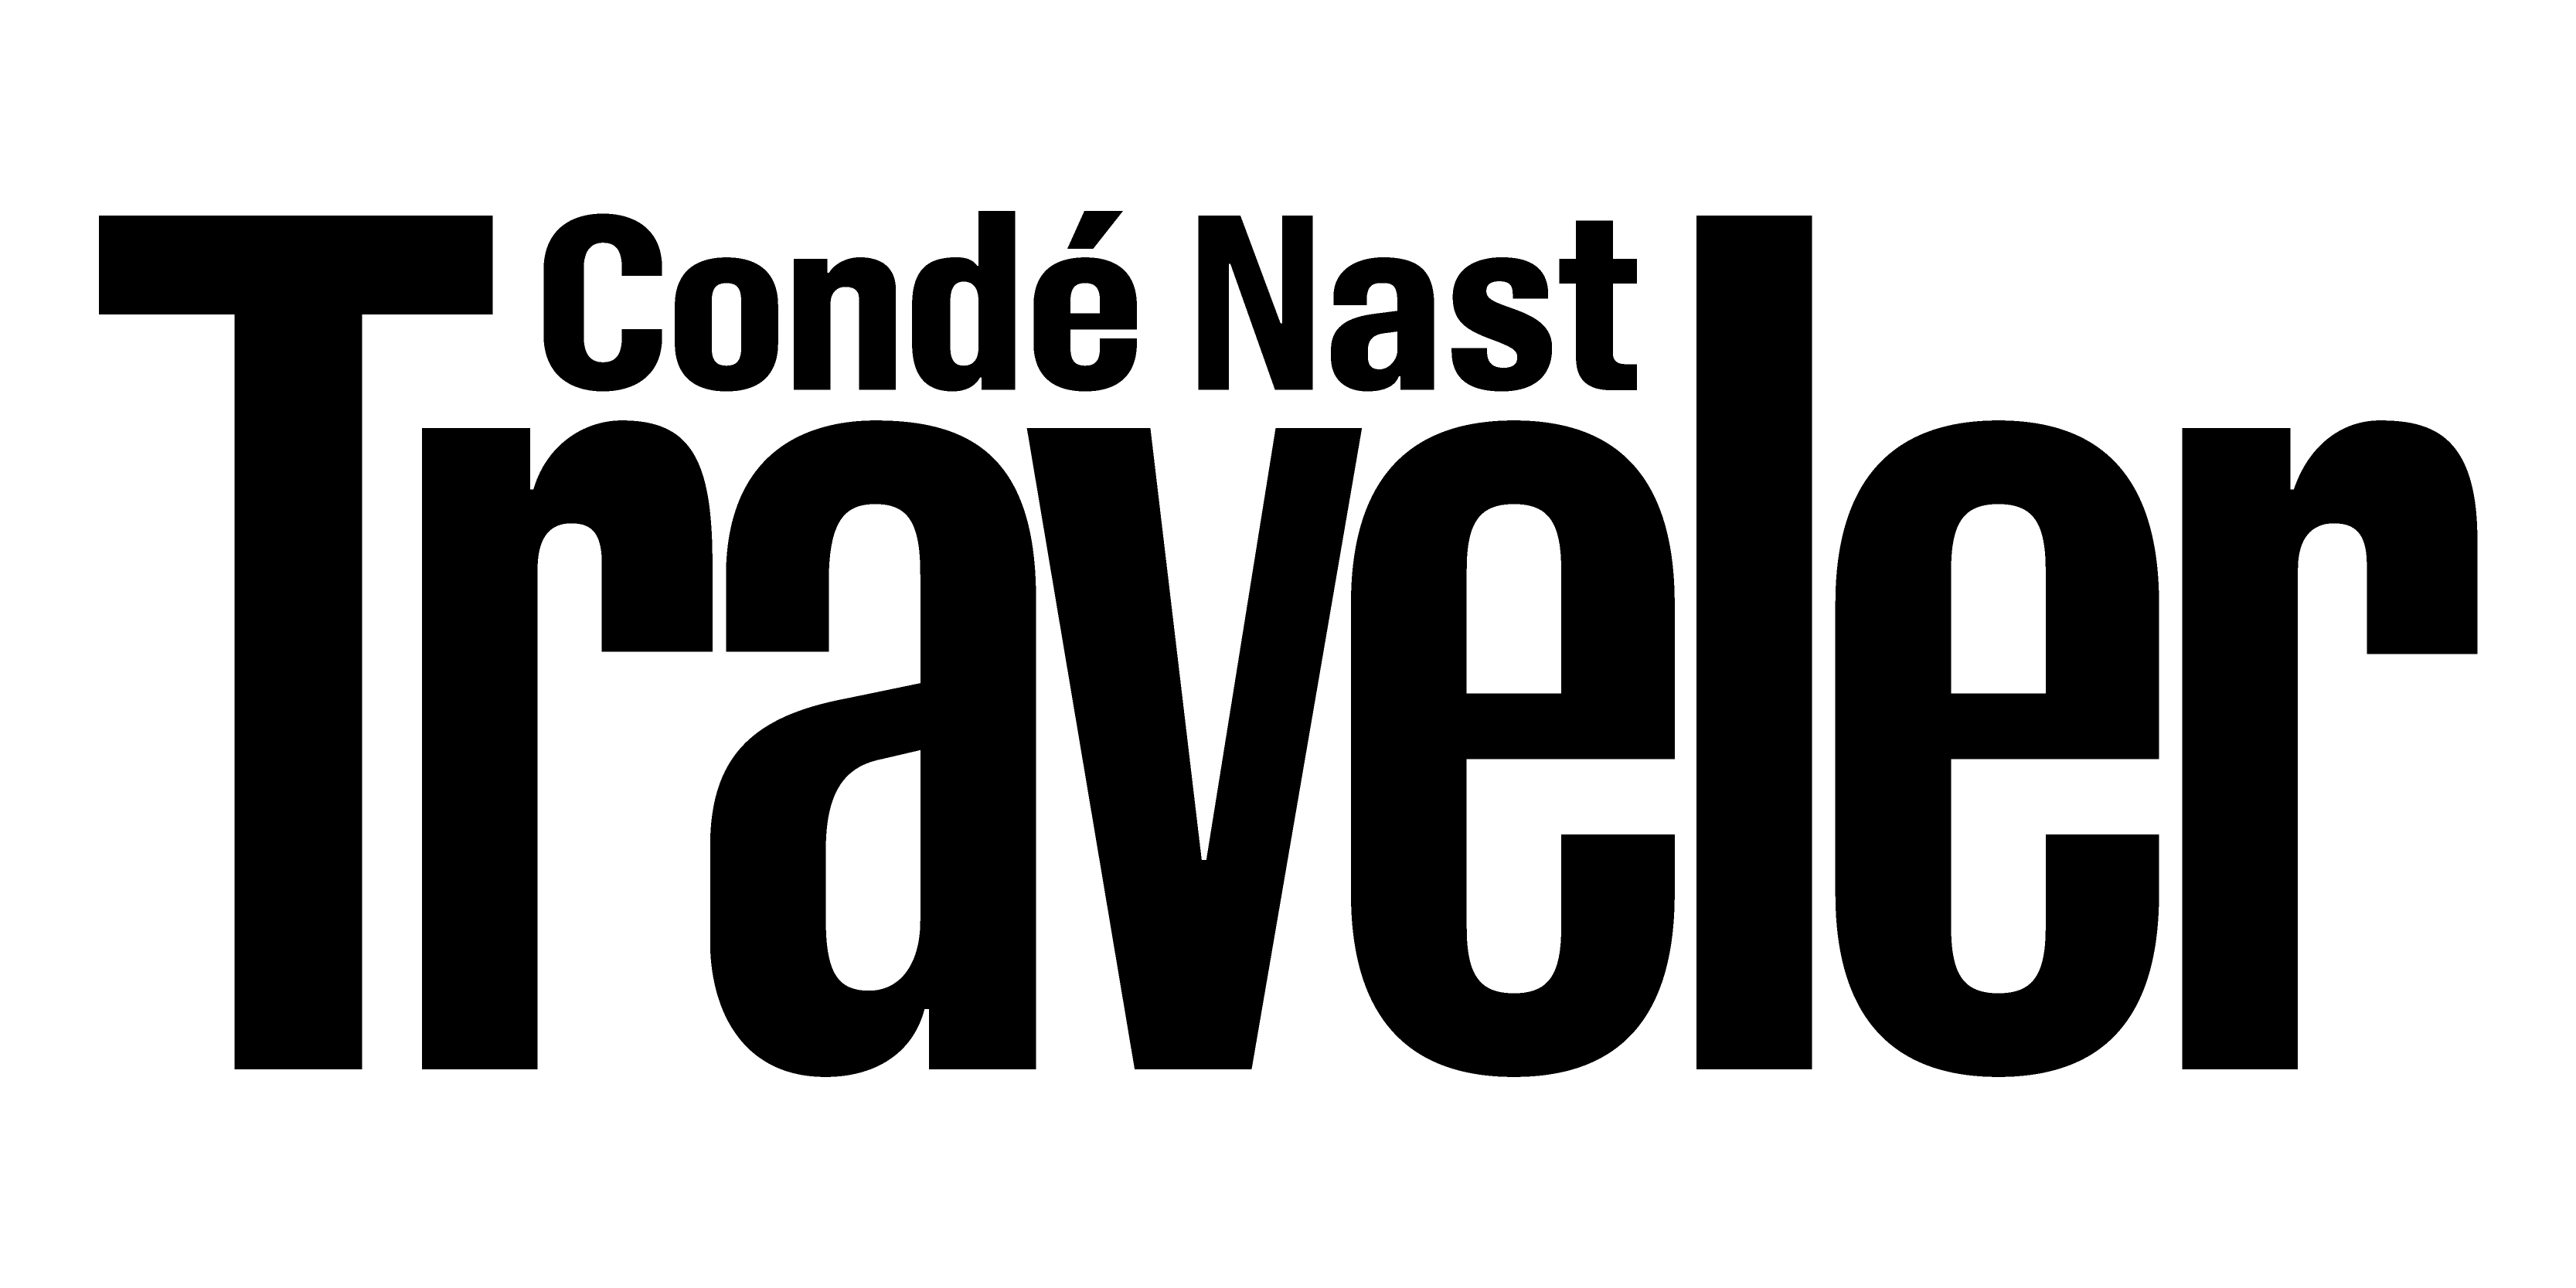 Cond%c3%a9 nast traveler logo